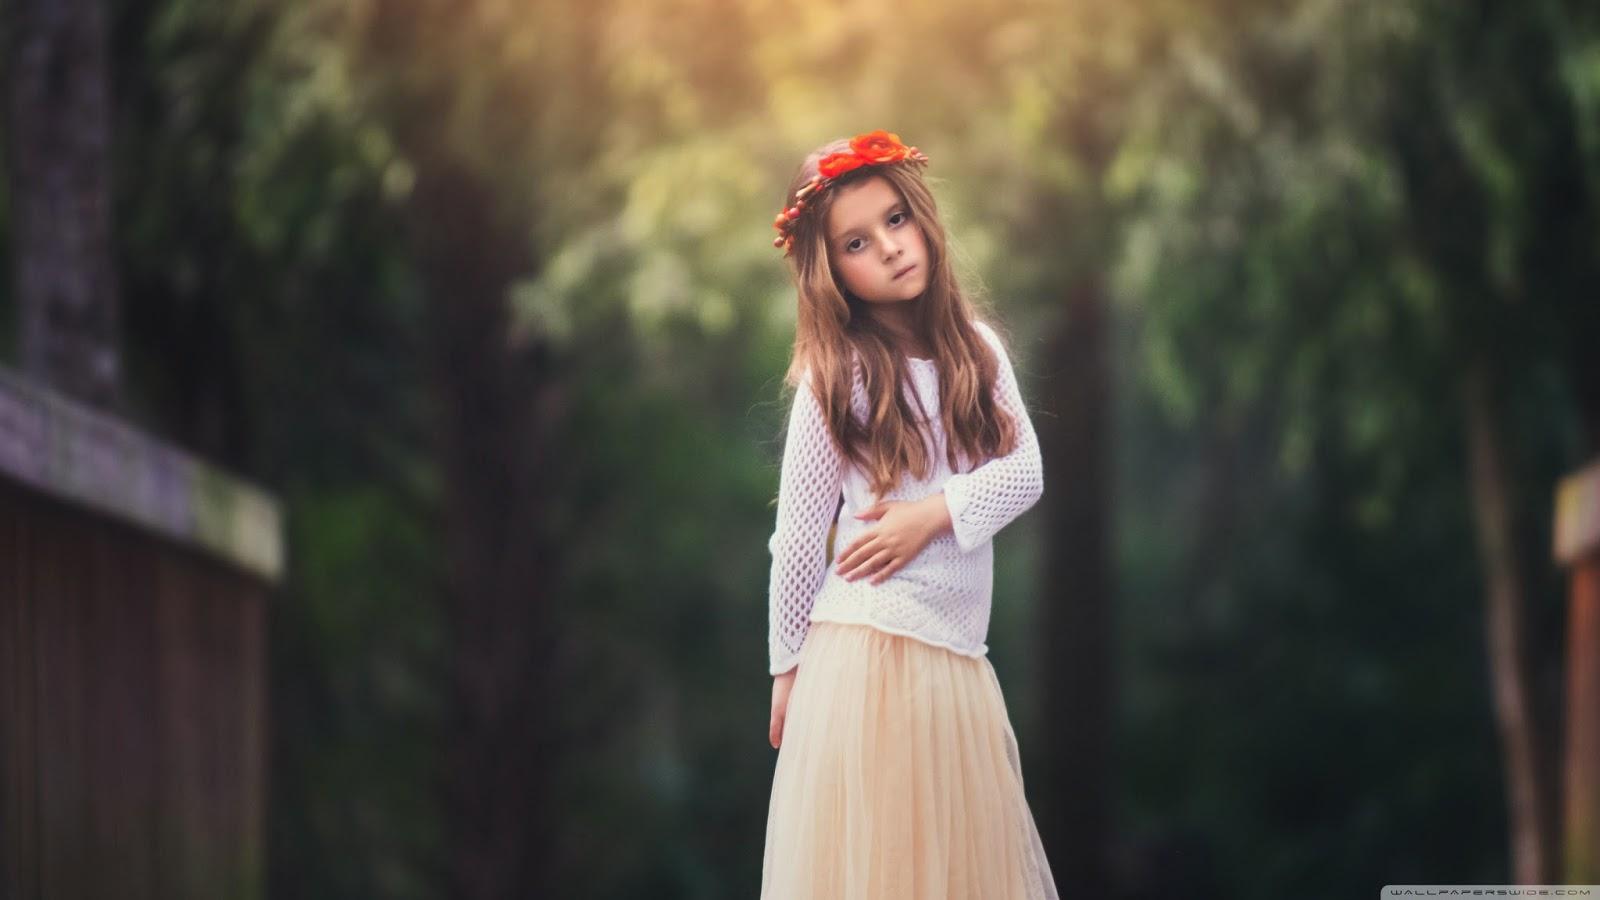 child girl photography wallpaper